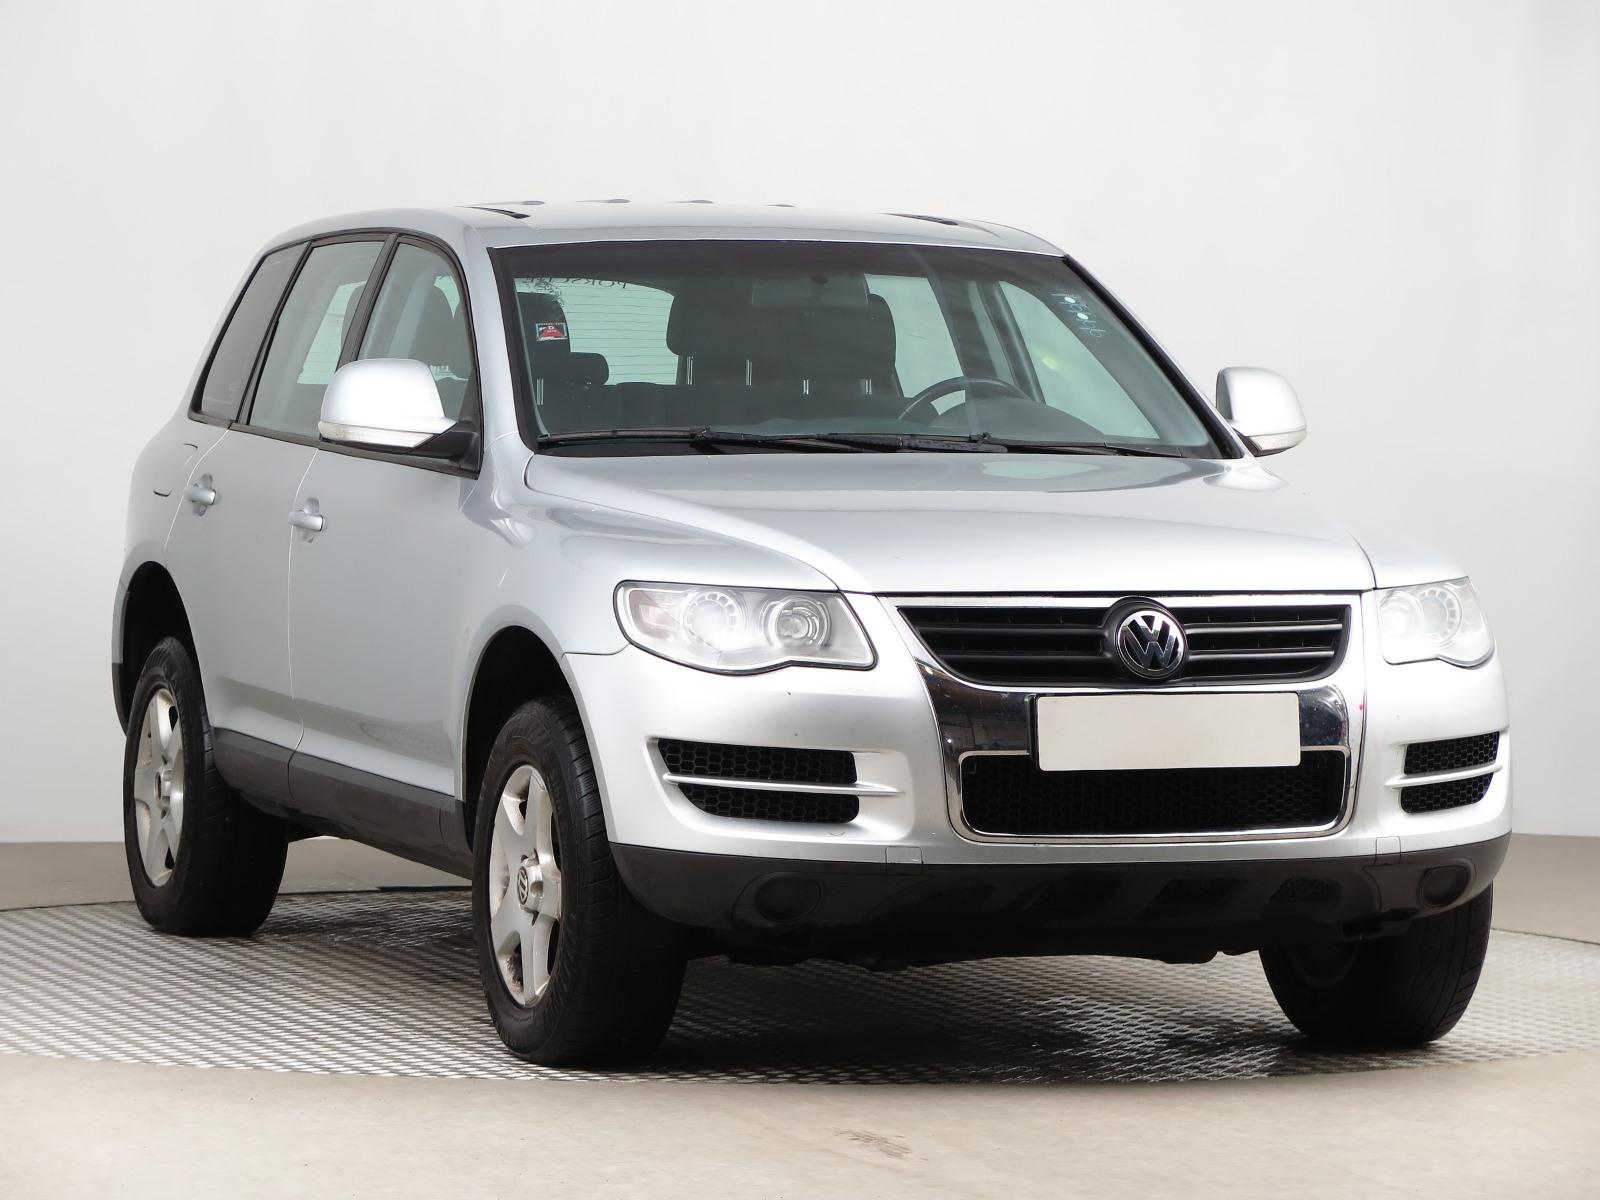 Volkswagen Touareg 2.5 R5 TDI